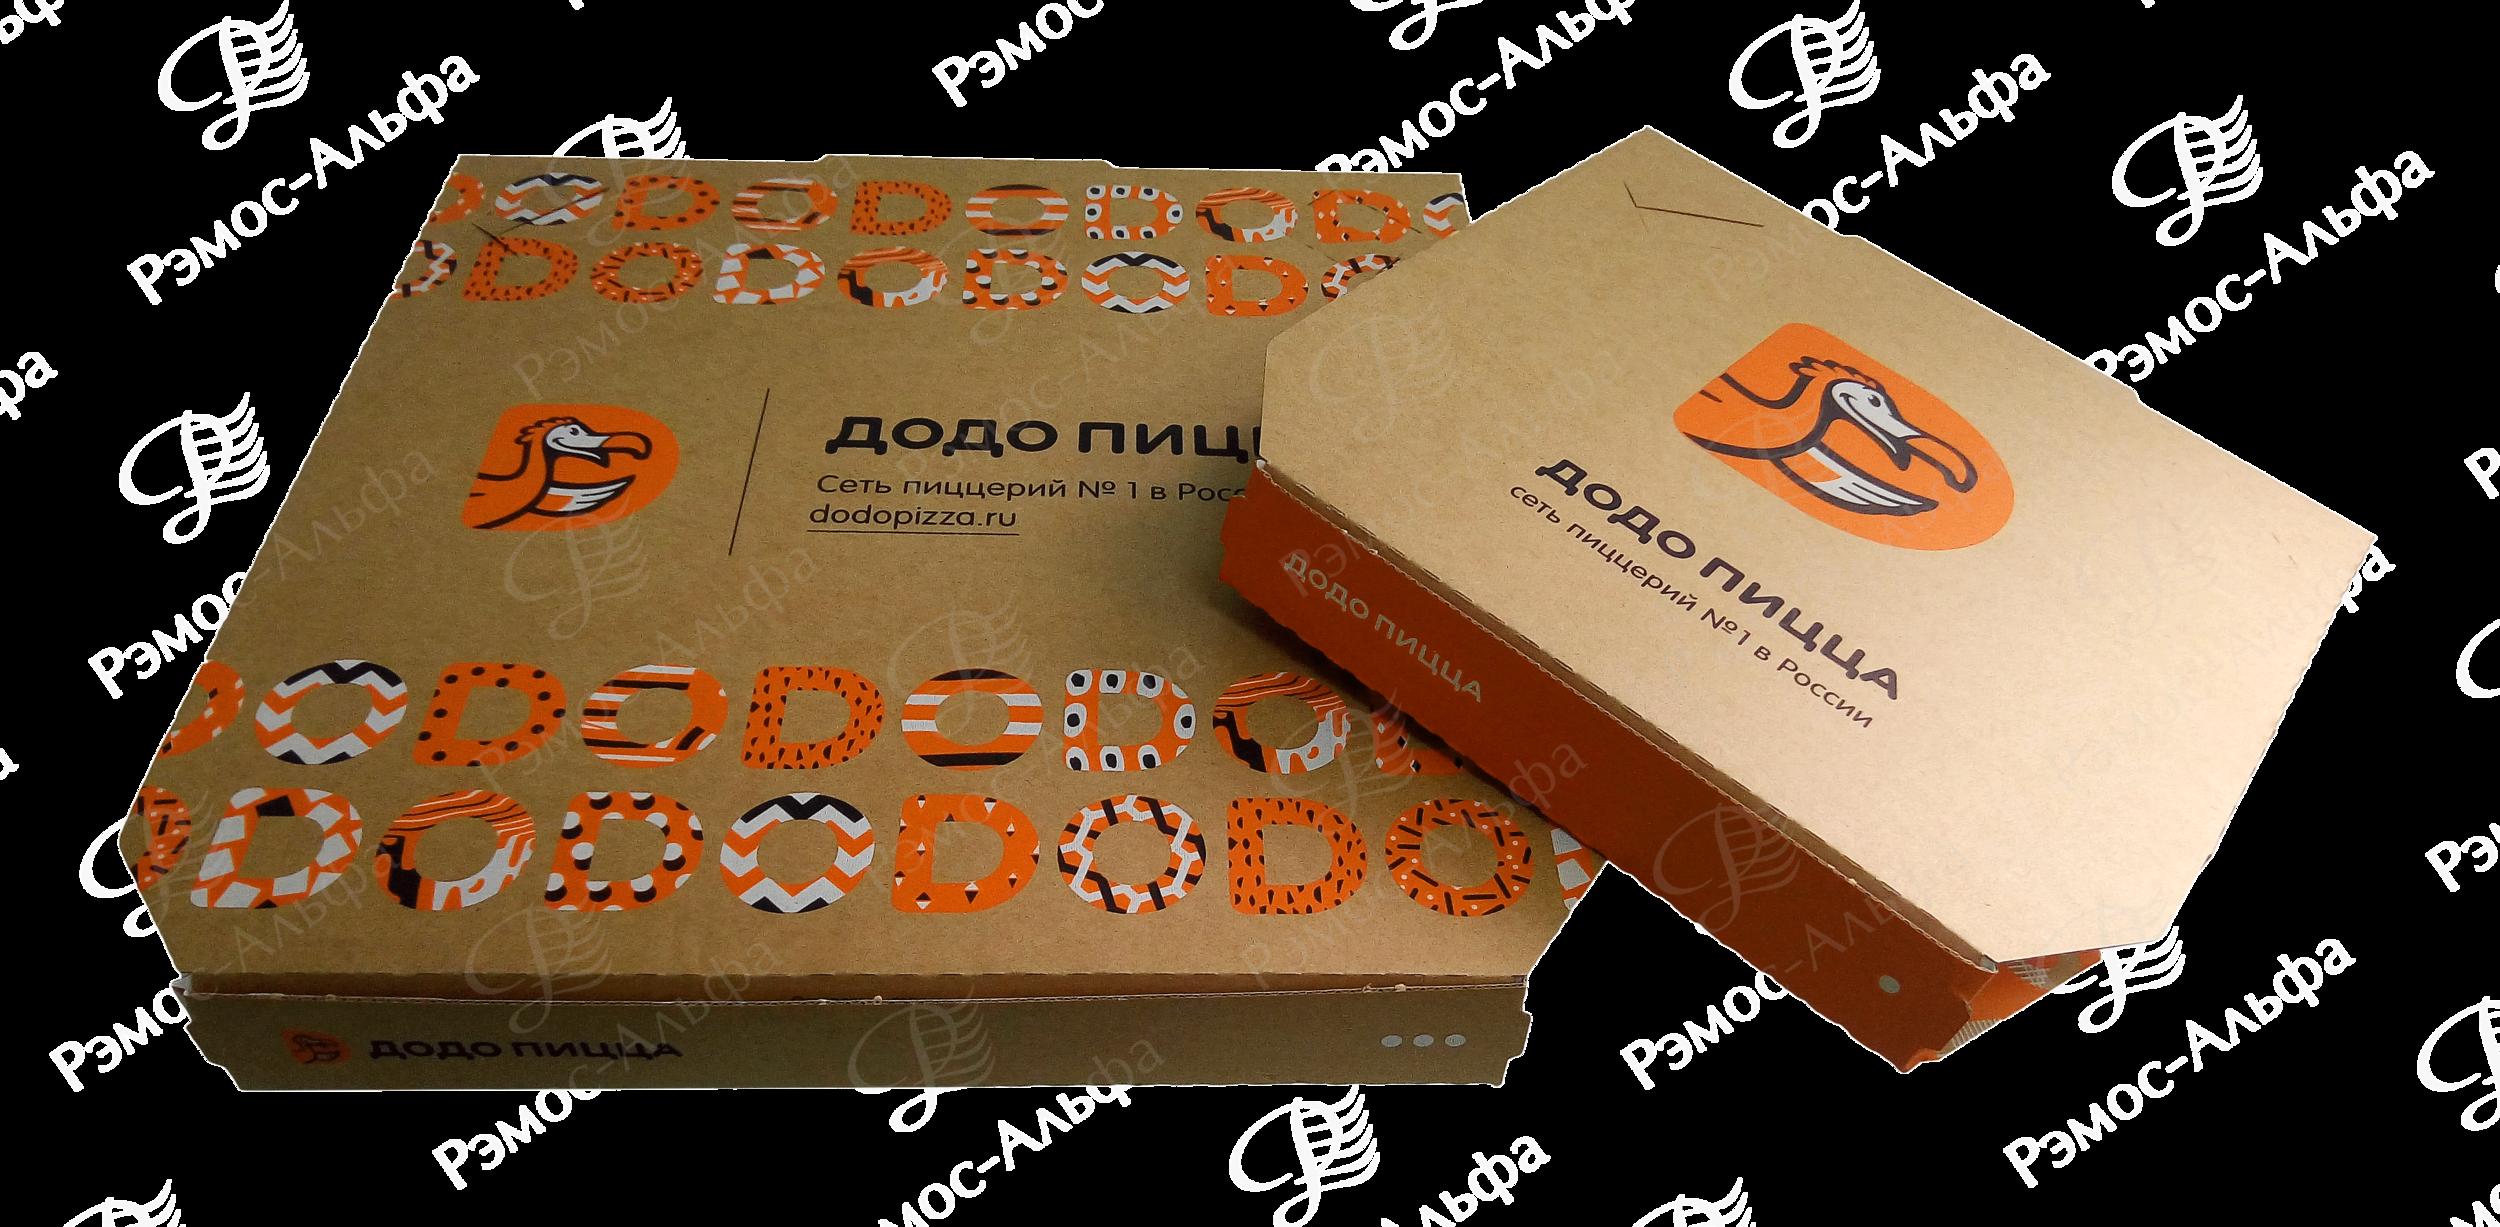 вз-Додо-пицца-2-короба.png